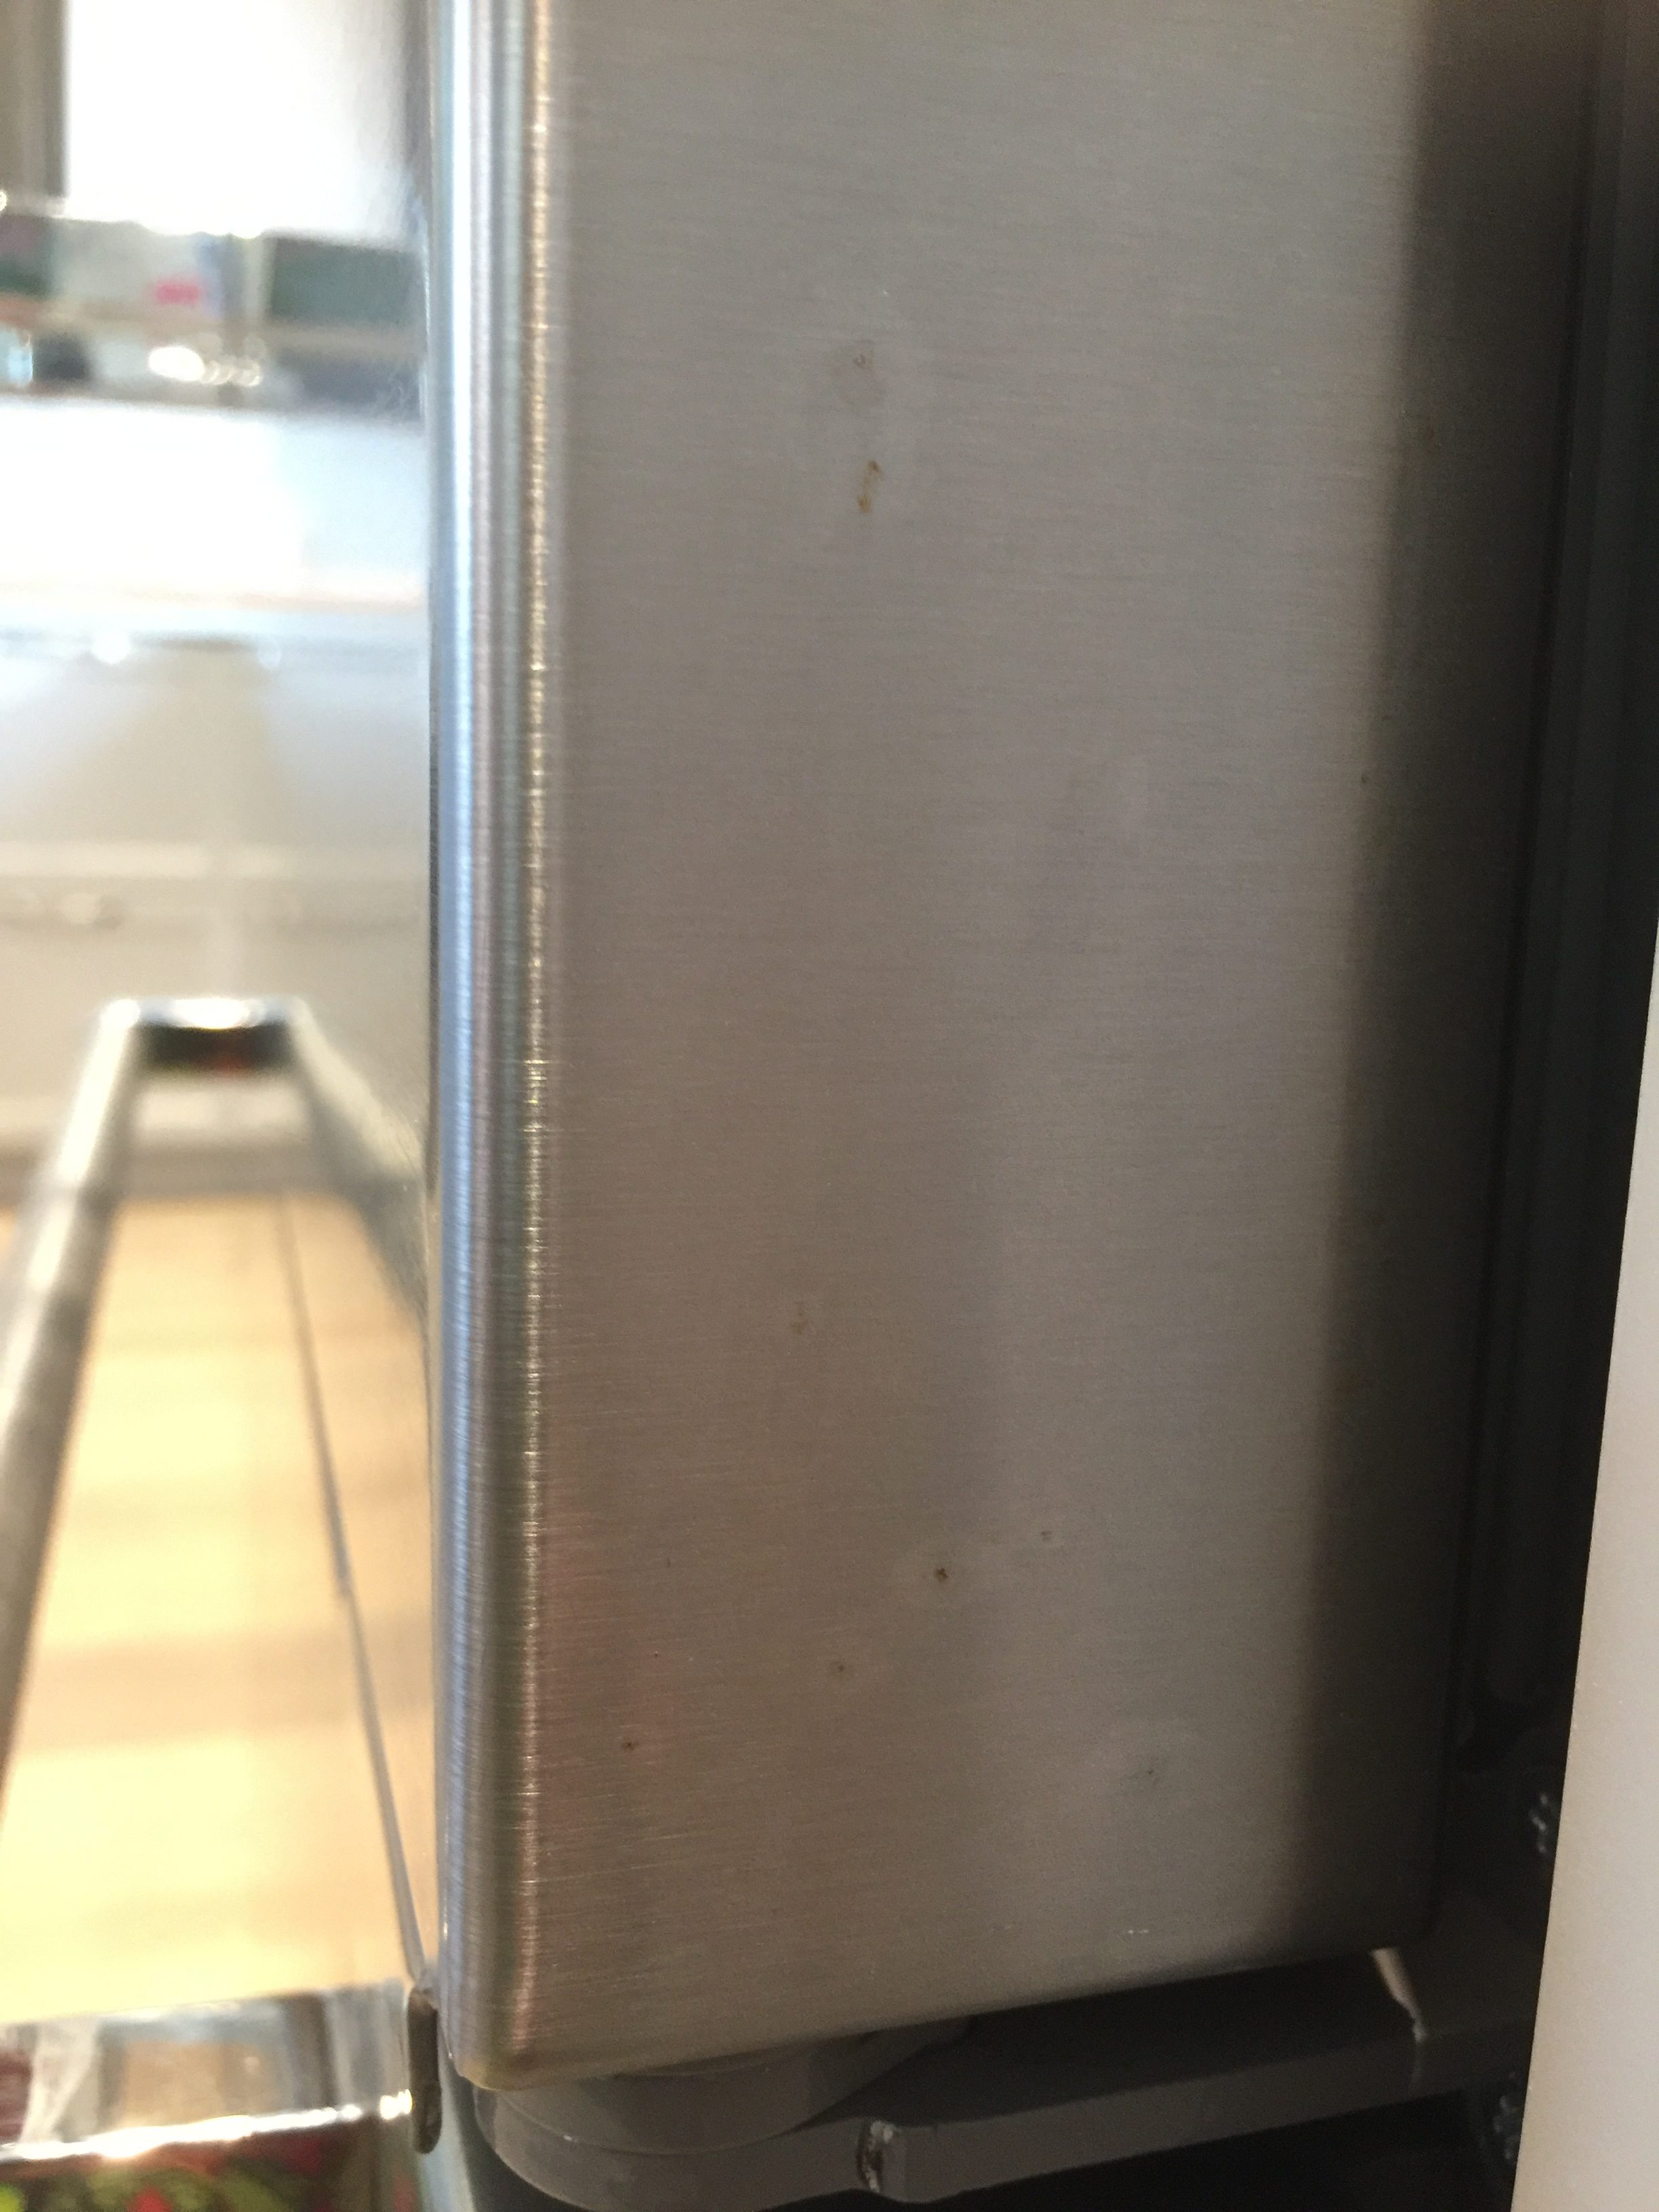 Top 804 Reviews and Complaints about KitchenAid Refrigerators